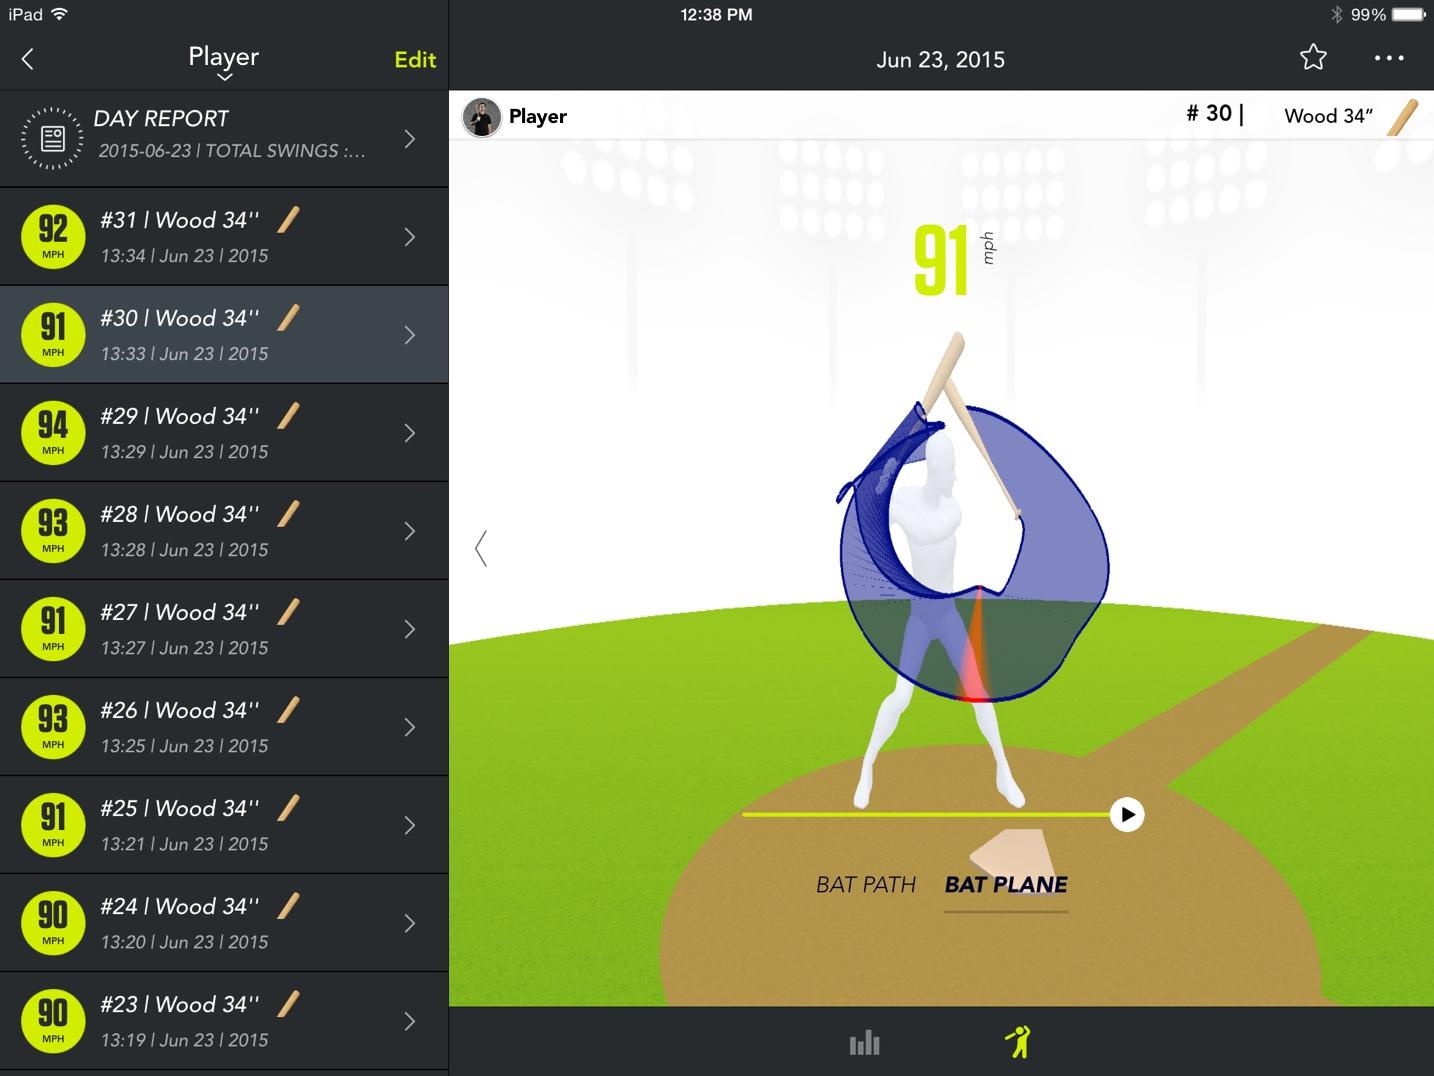 Zepp | Increase swing efficiency, bat speed & power